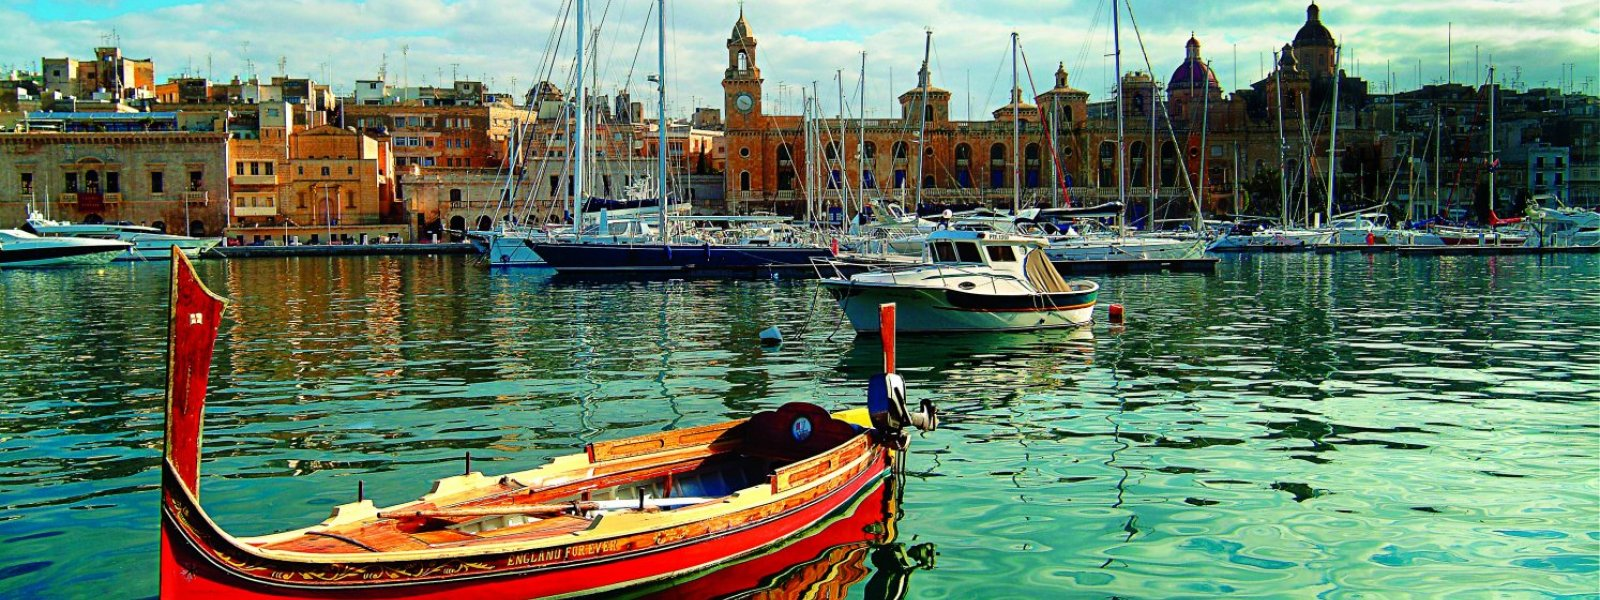 Malta perinteinen vene Luzzu